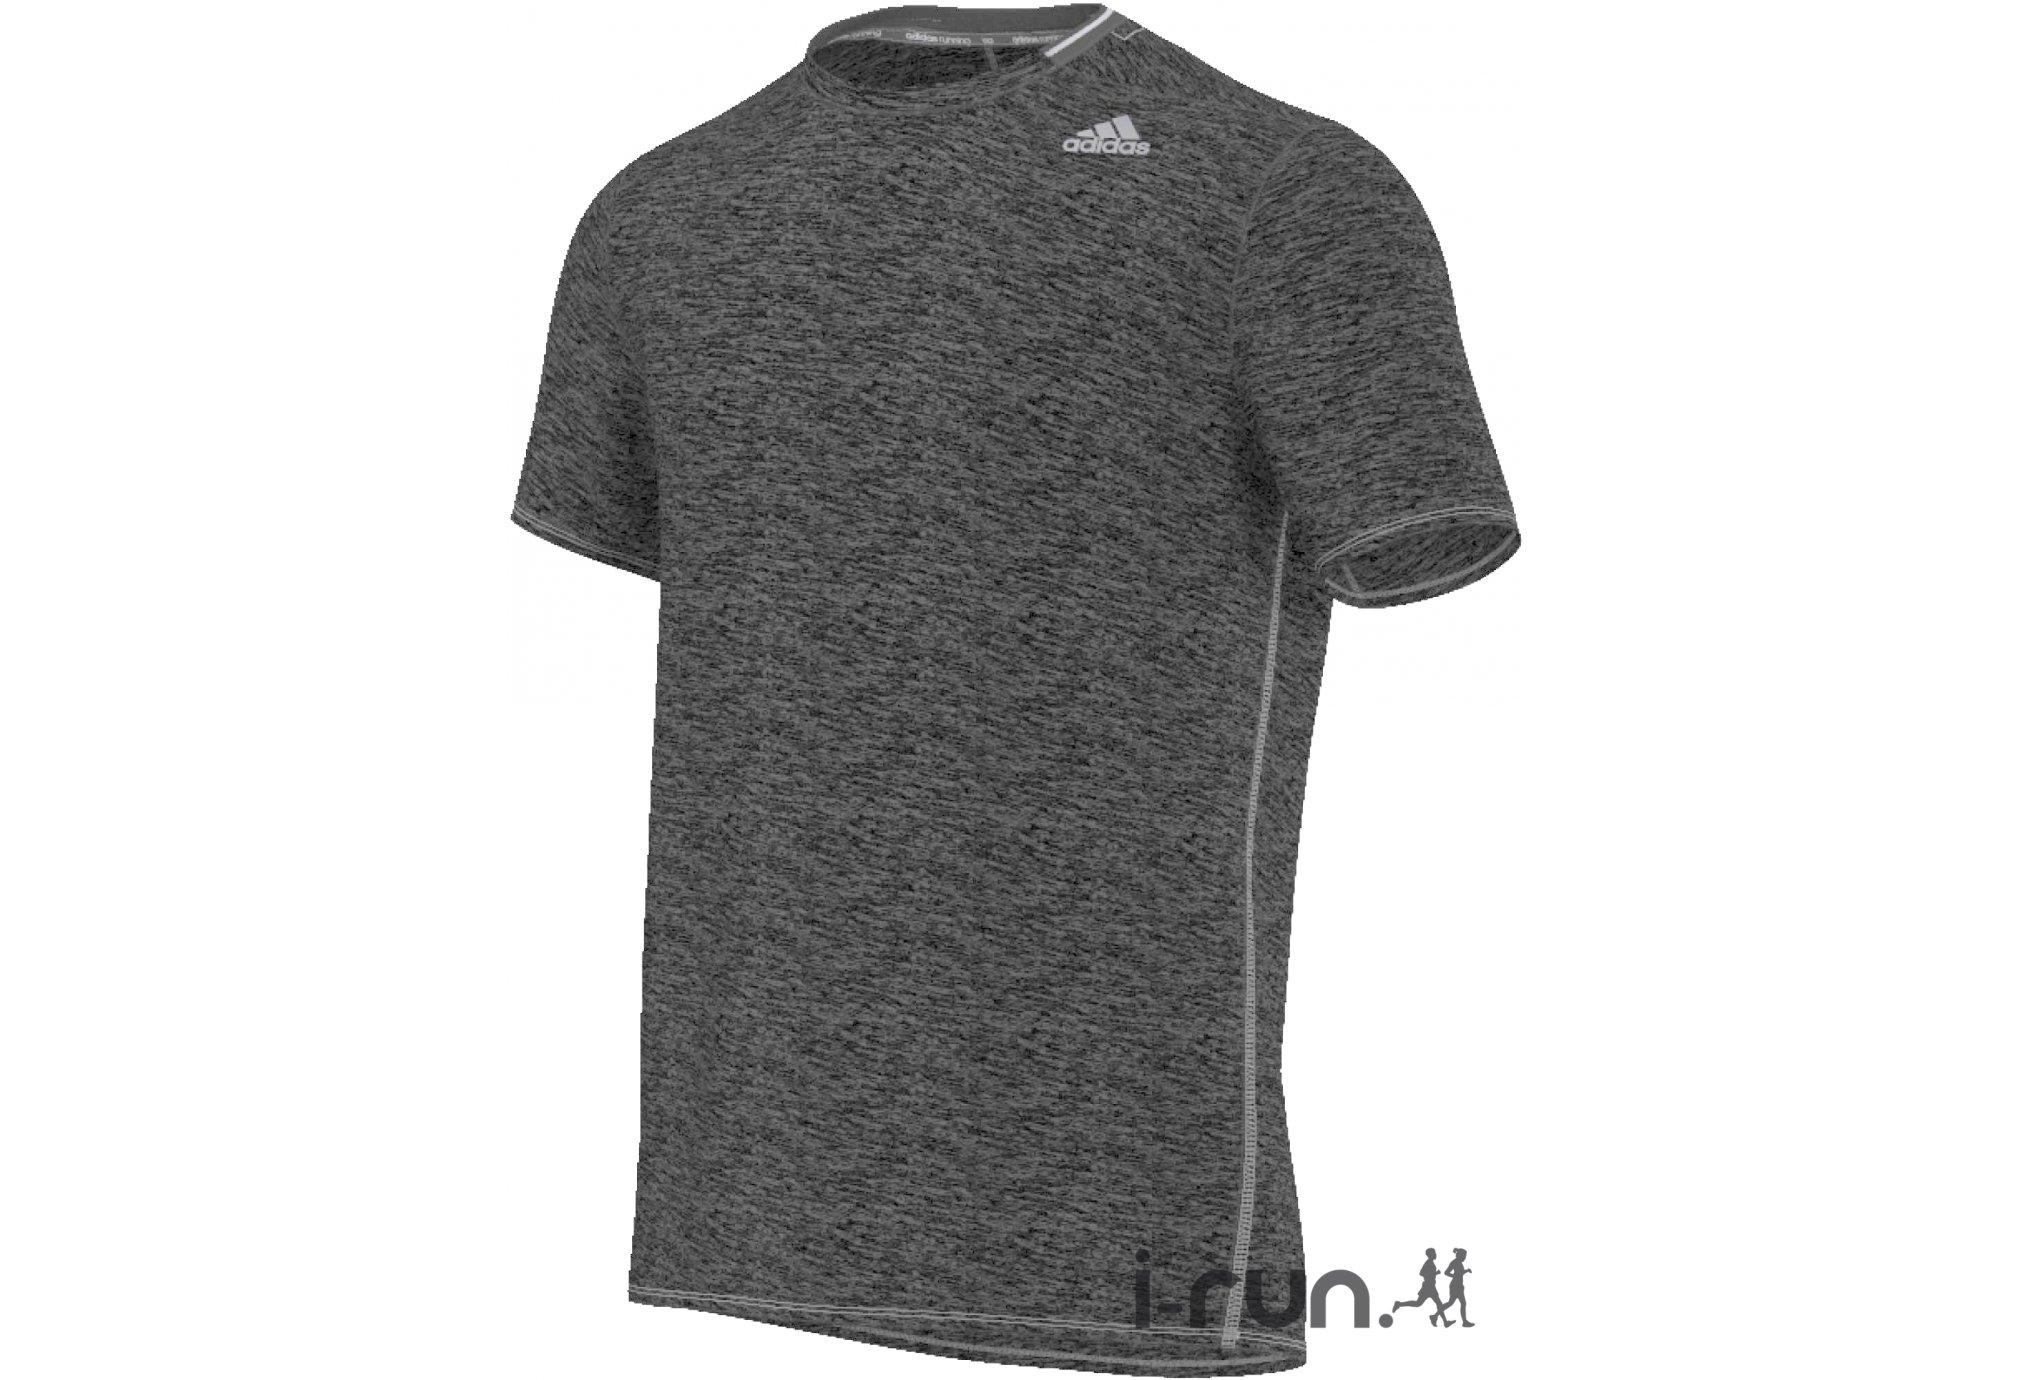 adidas Tee-shirt Supernova ClimaLite M vêtement running homme